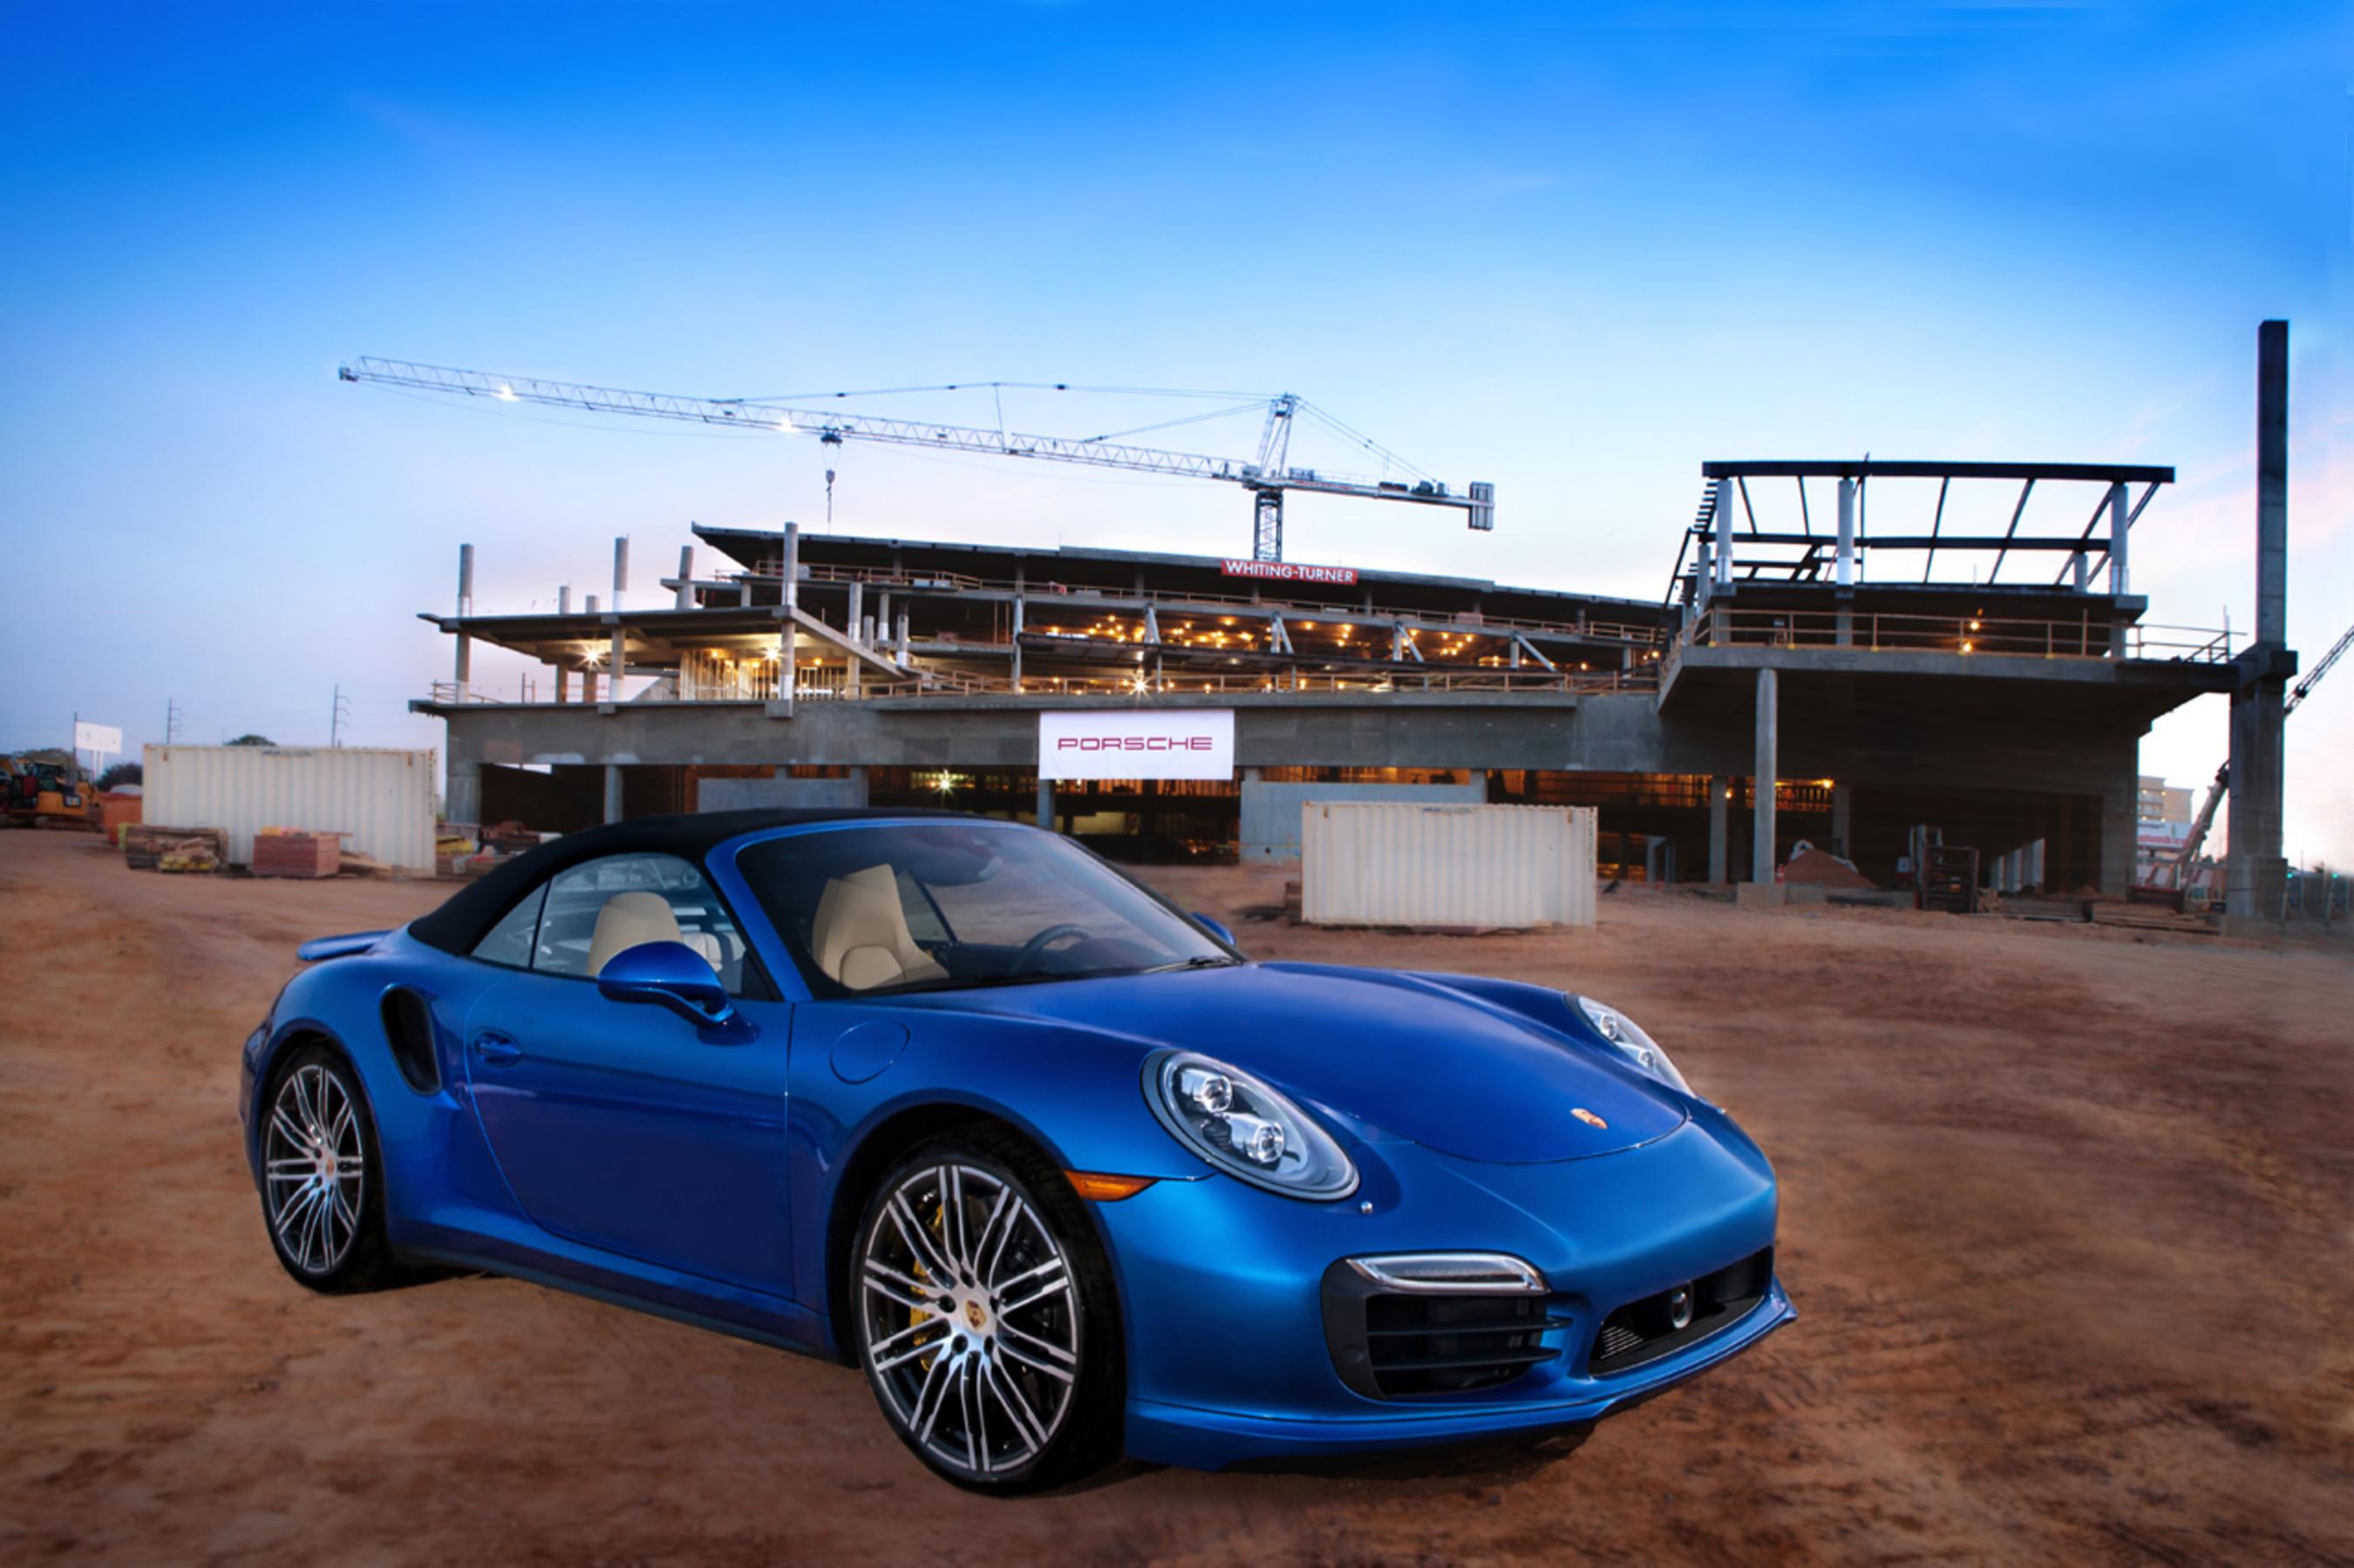 Where a vision becomes reality: Porsche Celebrates Topping Out of its Future Headquarters in Atlanta (PRNewsFoto/Porsche Cars North America, Inc.)